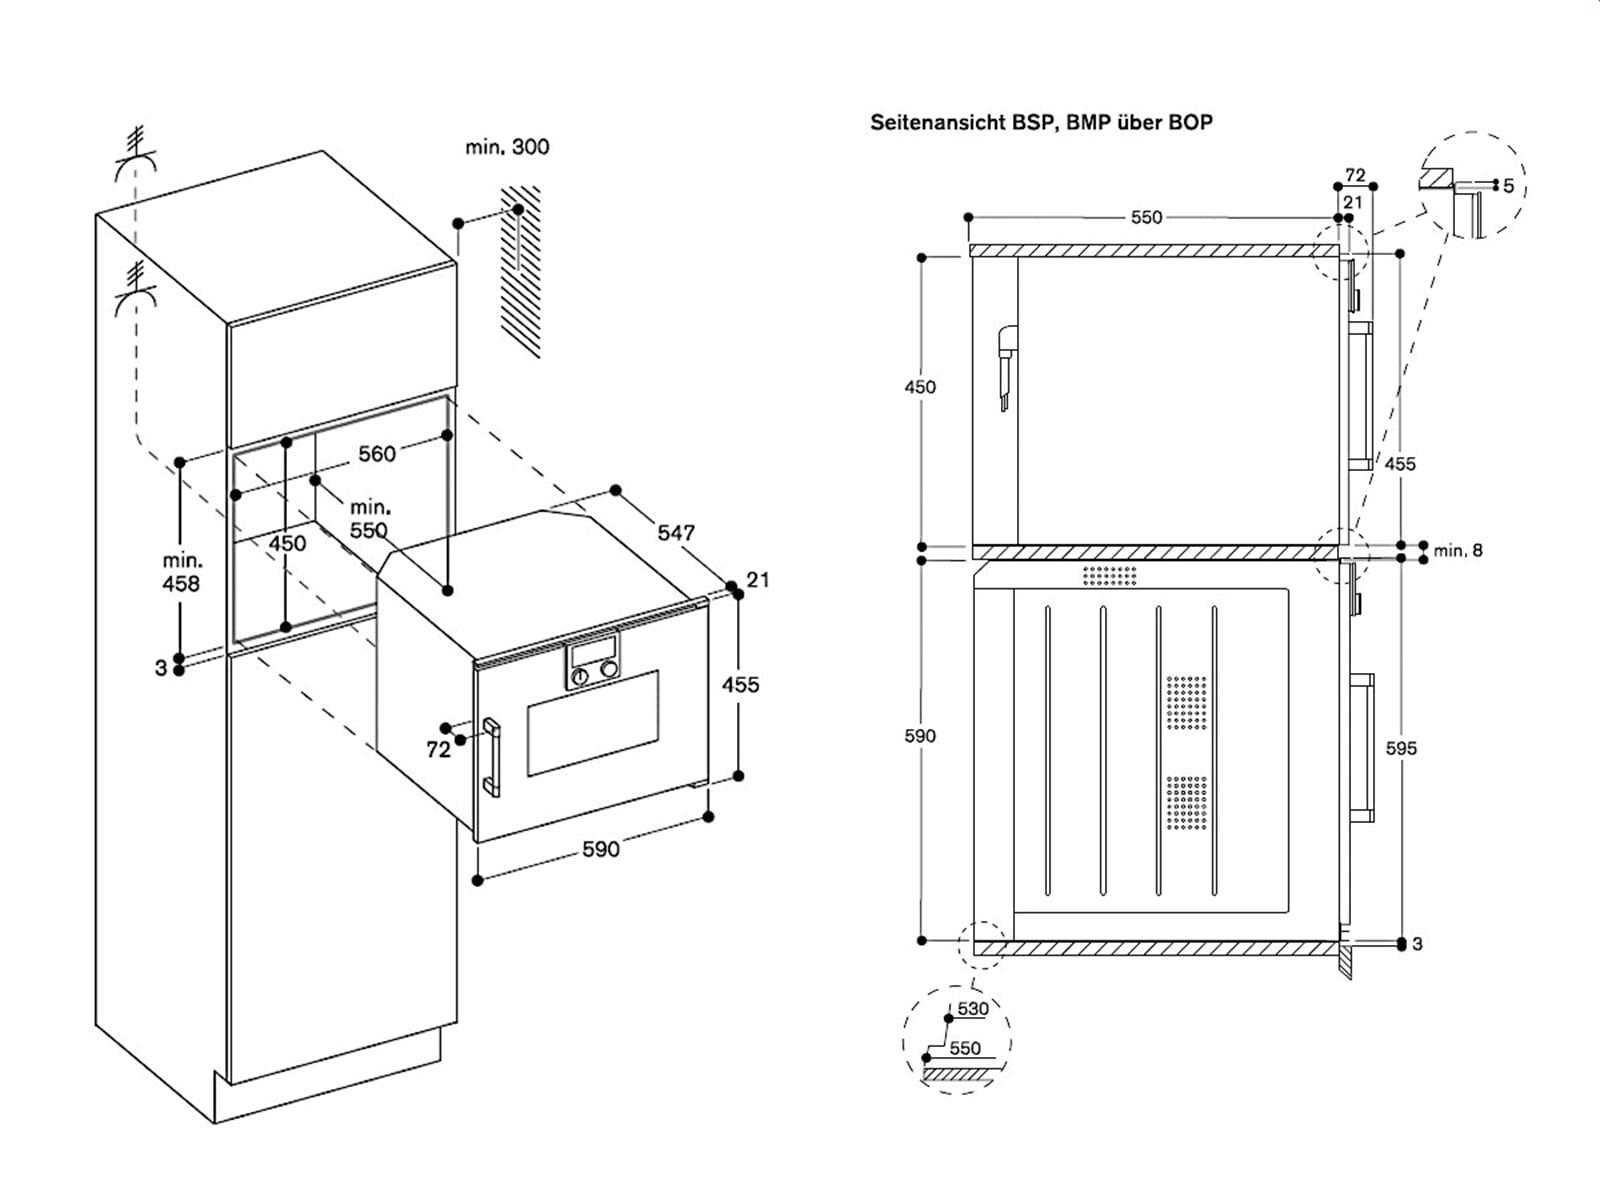 Gaggenau BSP 221 130 Kompakt Dampfgarer Serie 200 Silber